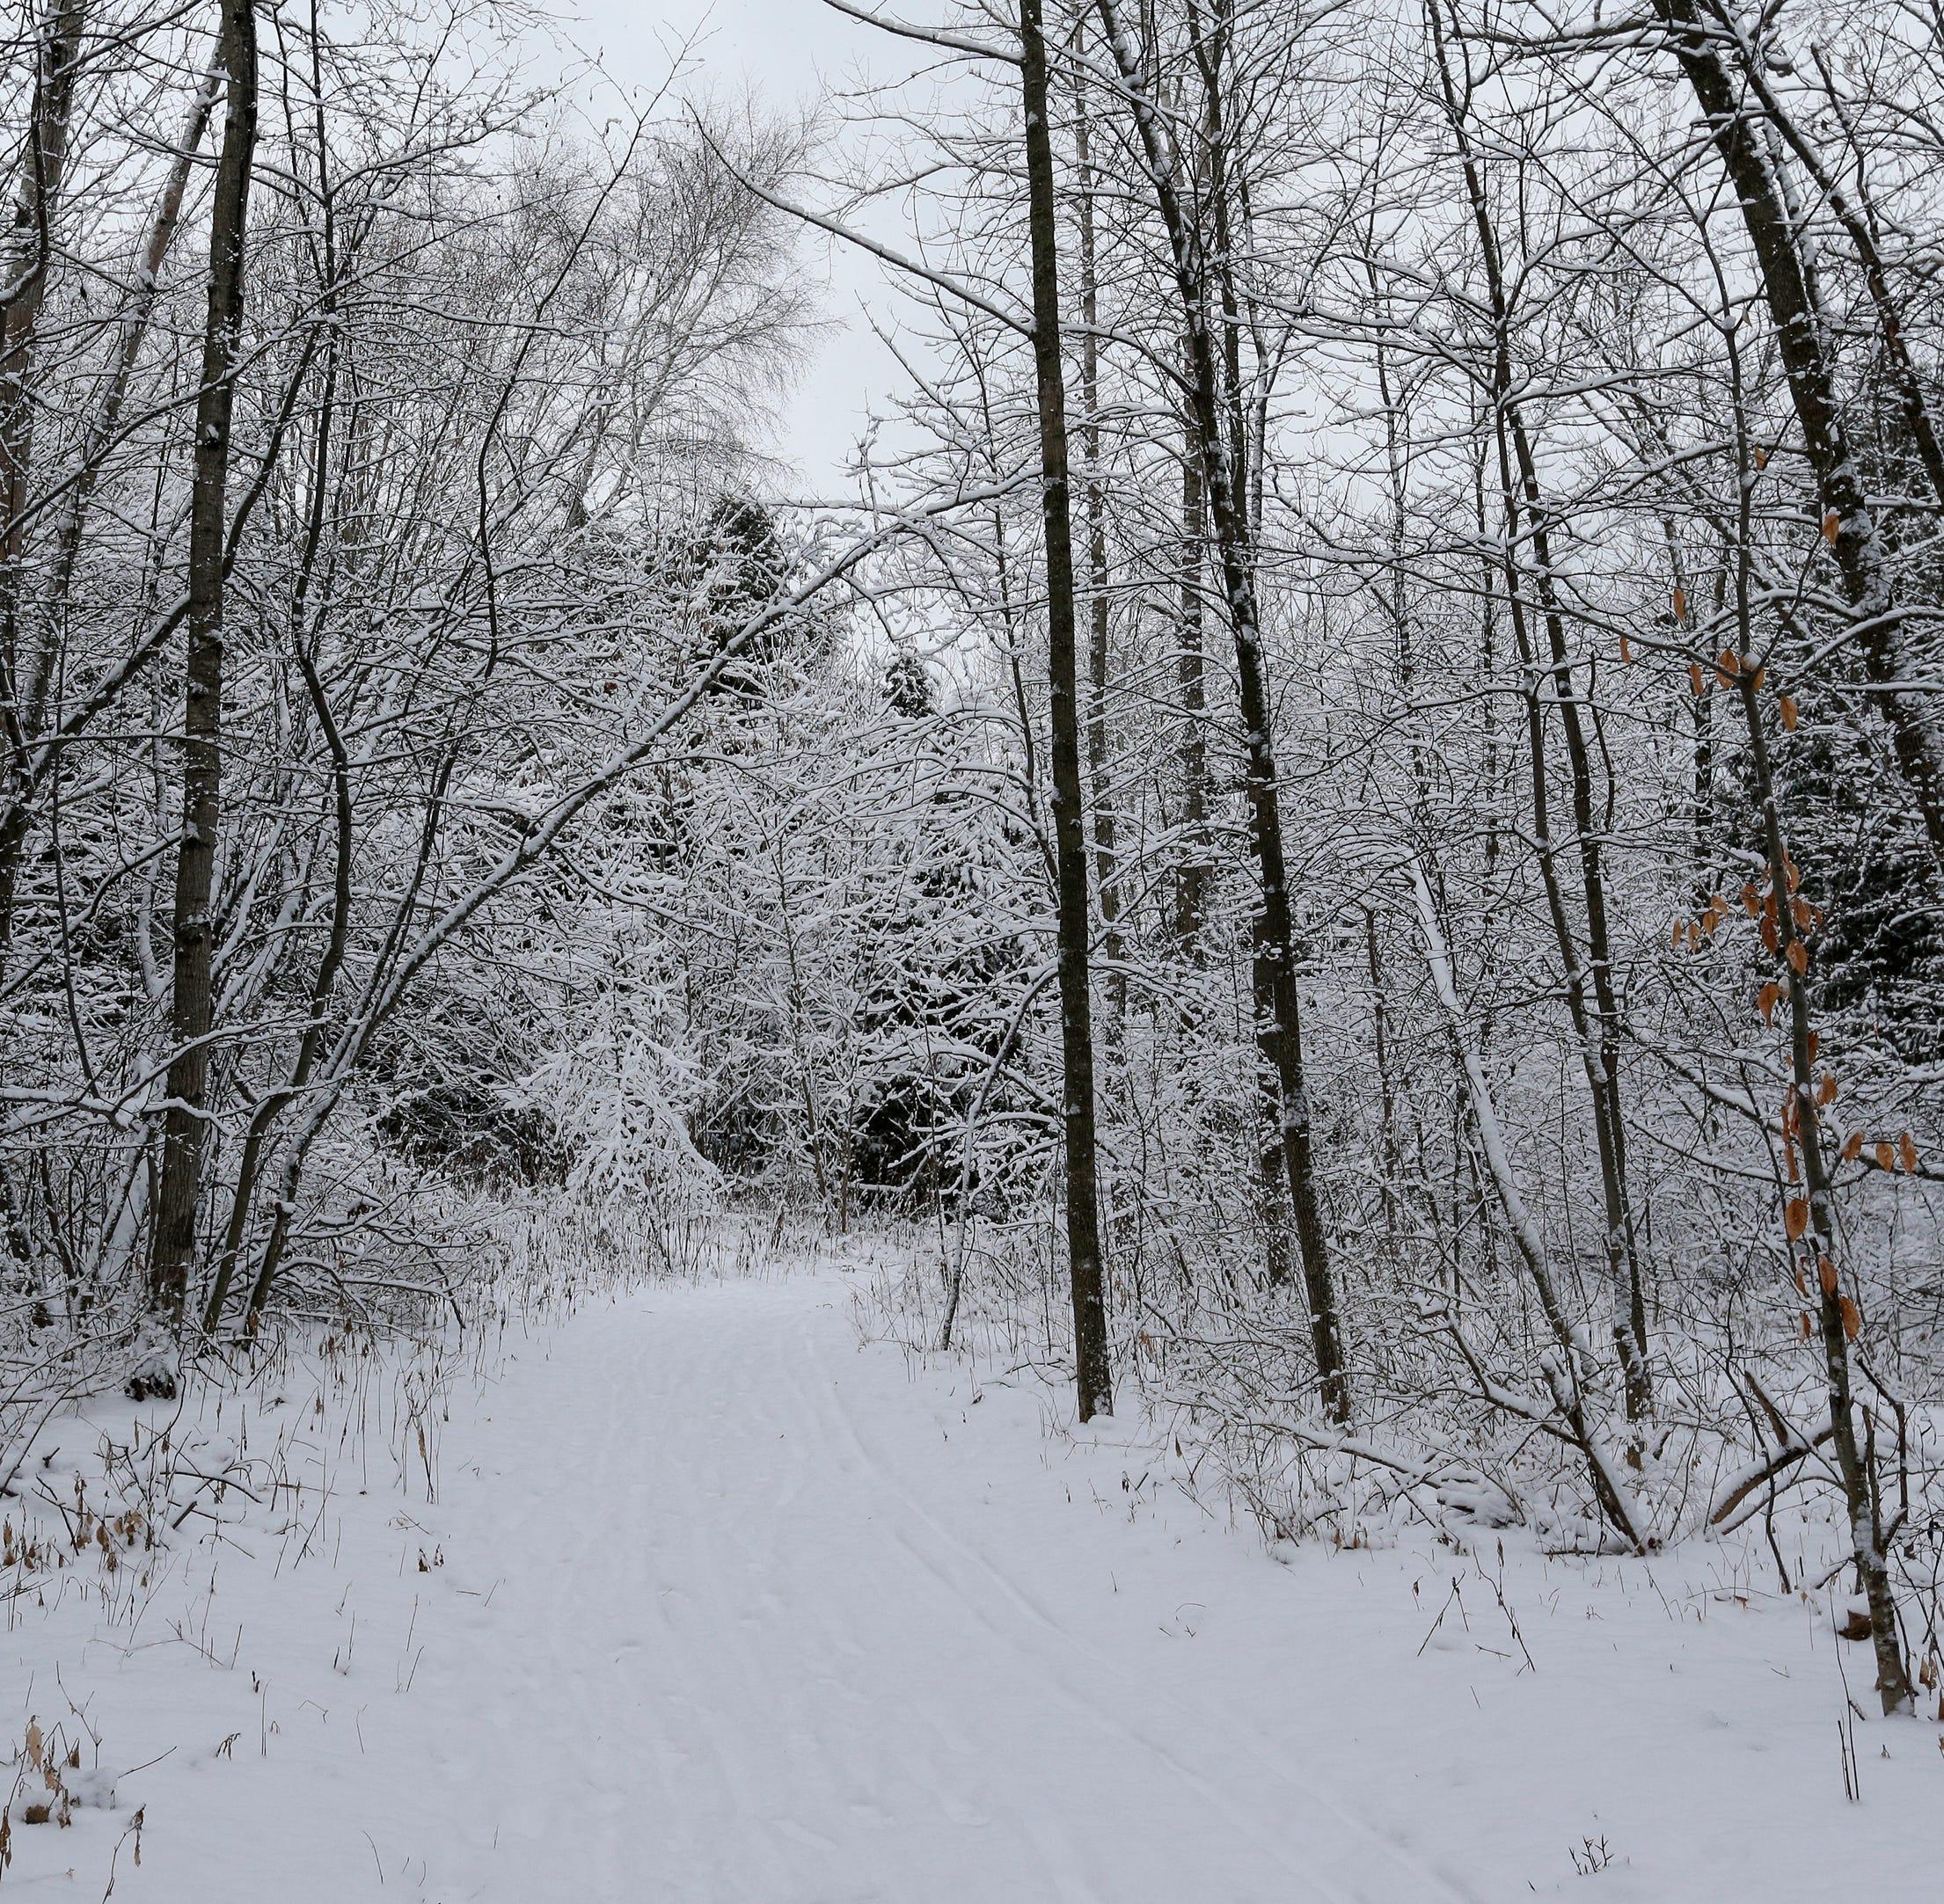 January in Wisconsin: Ice fishing, frostbitten fingers and sledding | Nancy Drury